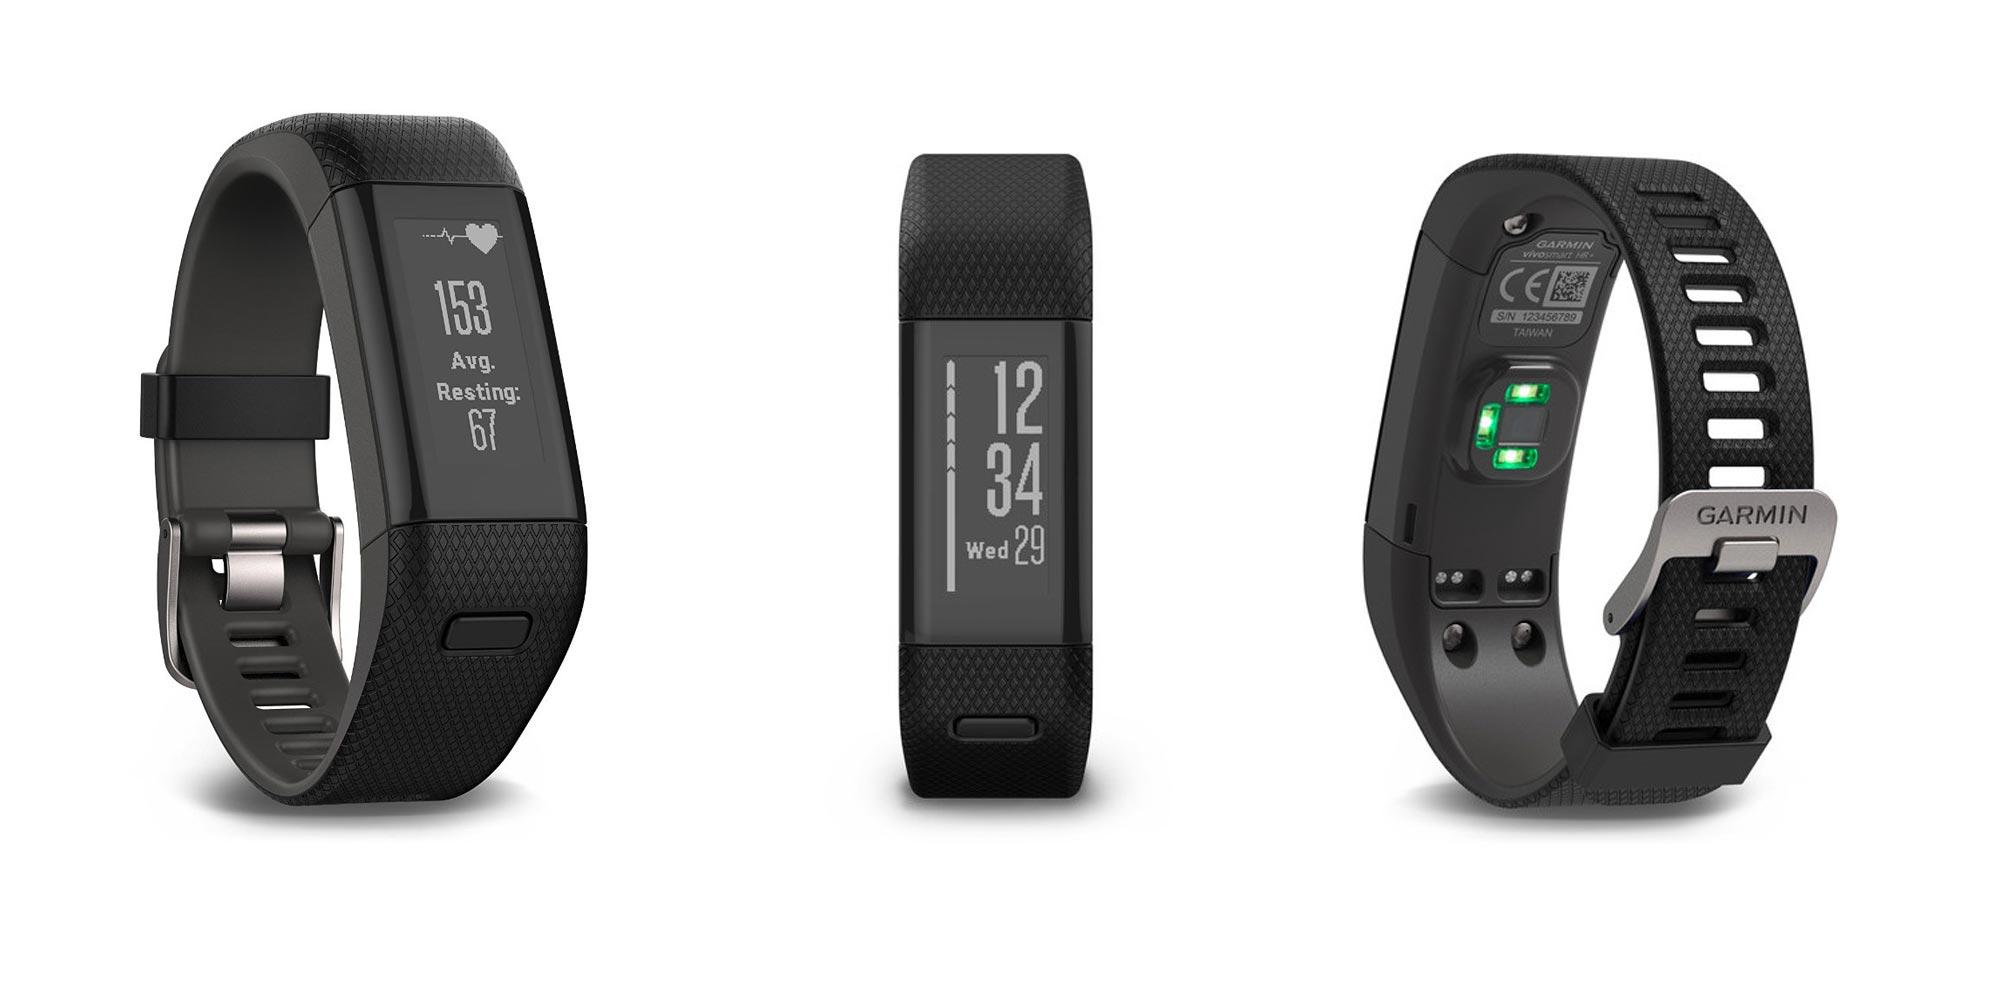 Garmin's vívosmart HR+ activity tracker keeps tabs on swims, heart rate, & more for $93 (Reg. $100+)